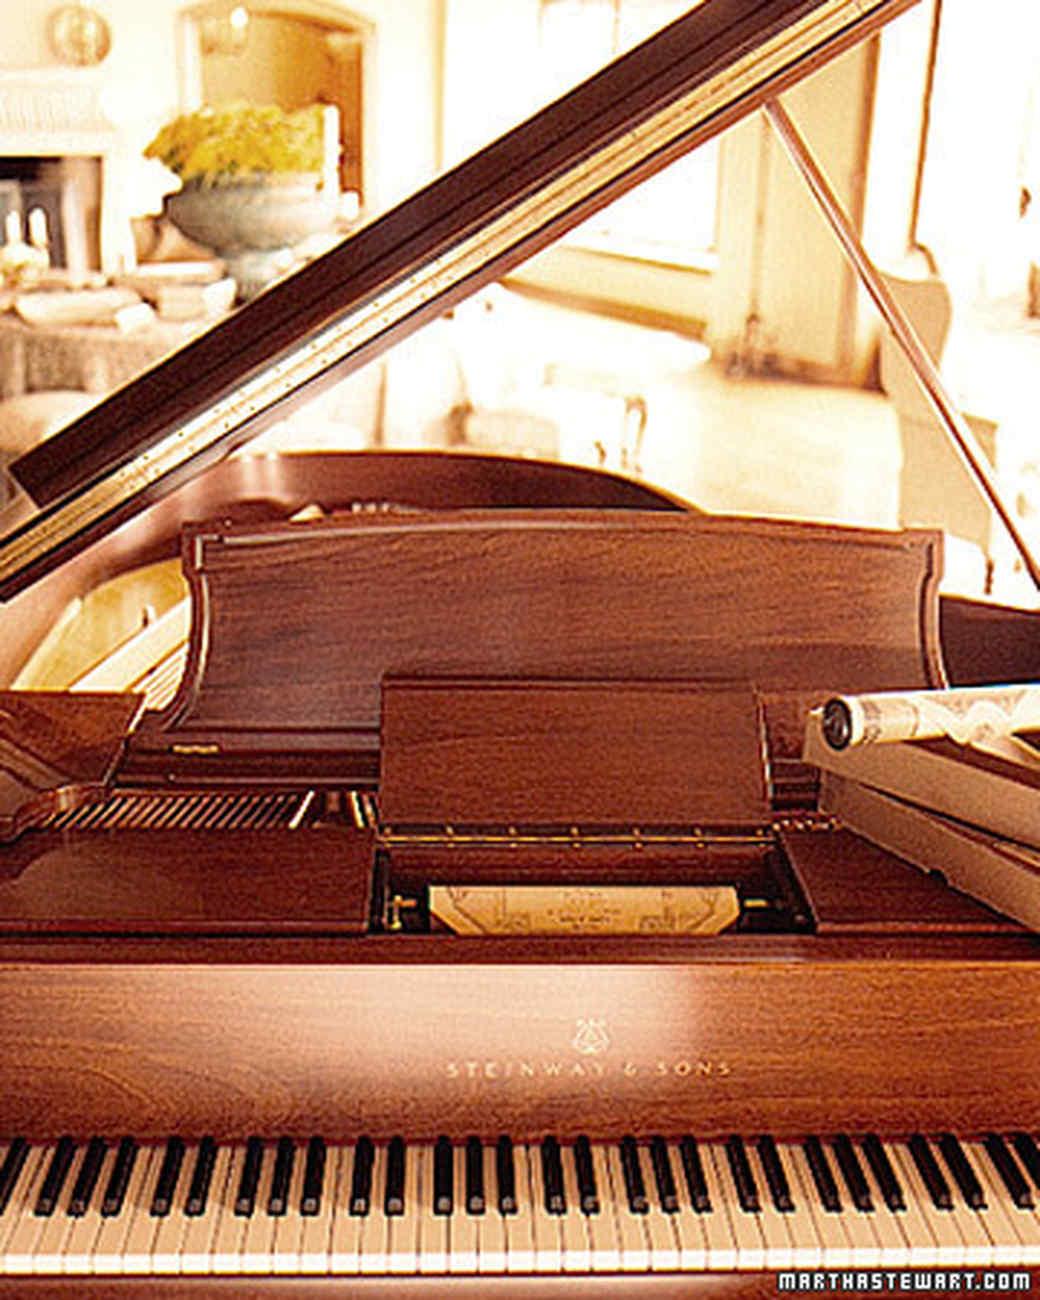 a98361_0900_piano.jpg